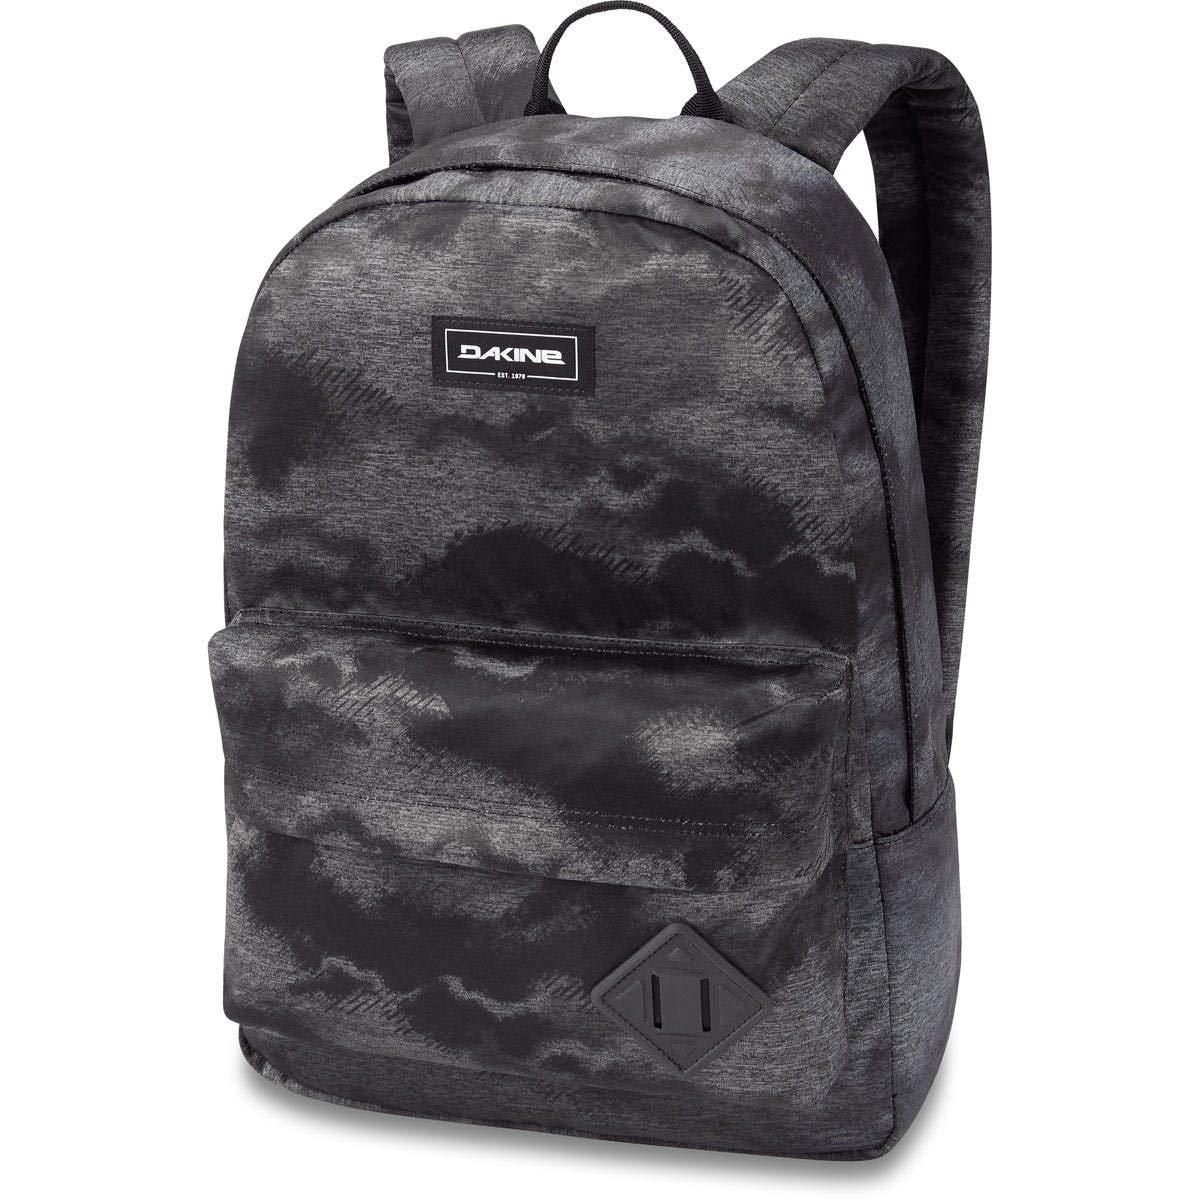 Dakine Unisex 365 Pack Backpack 21L Ashcroft Black Jersey One Size